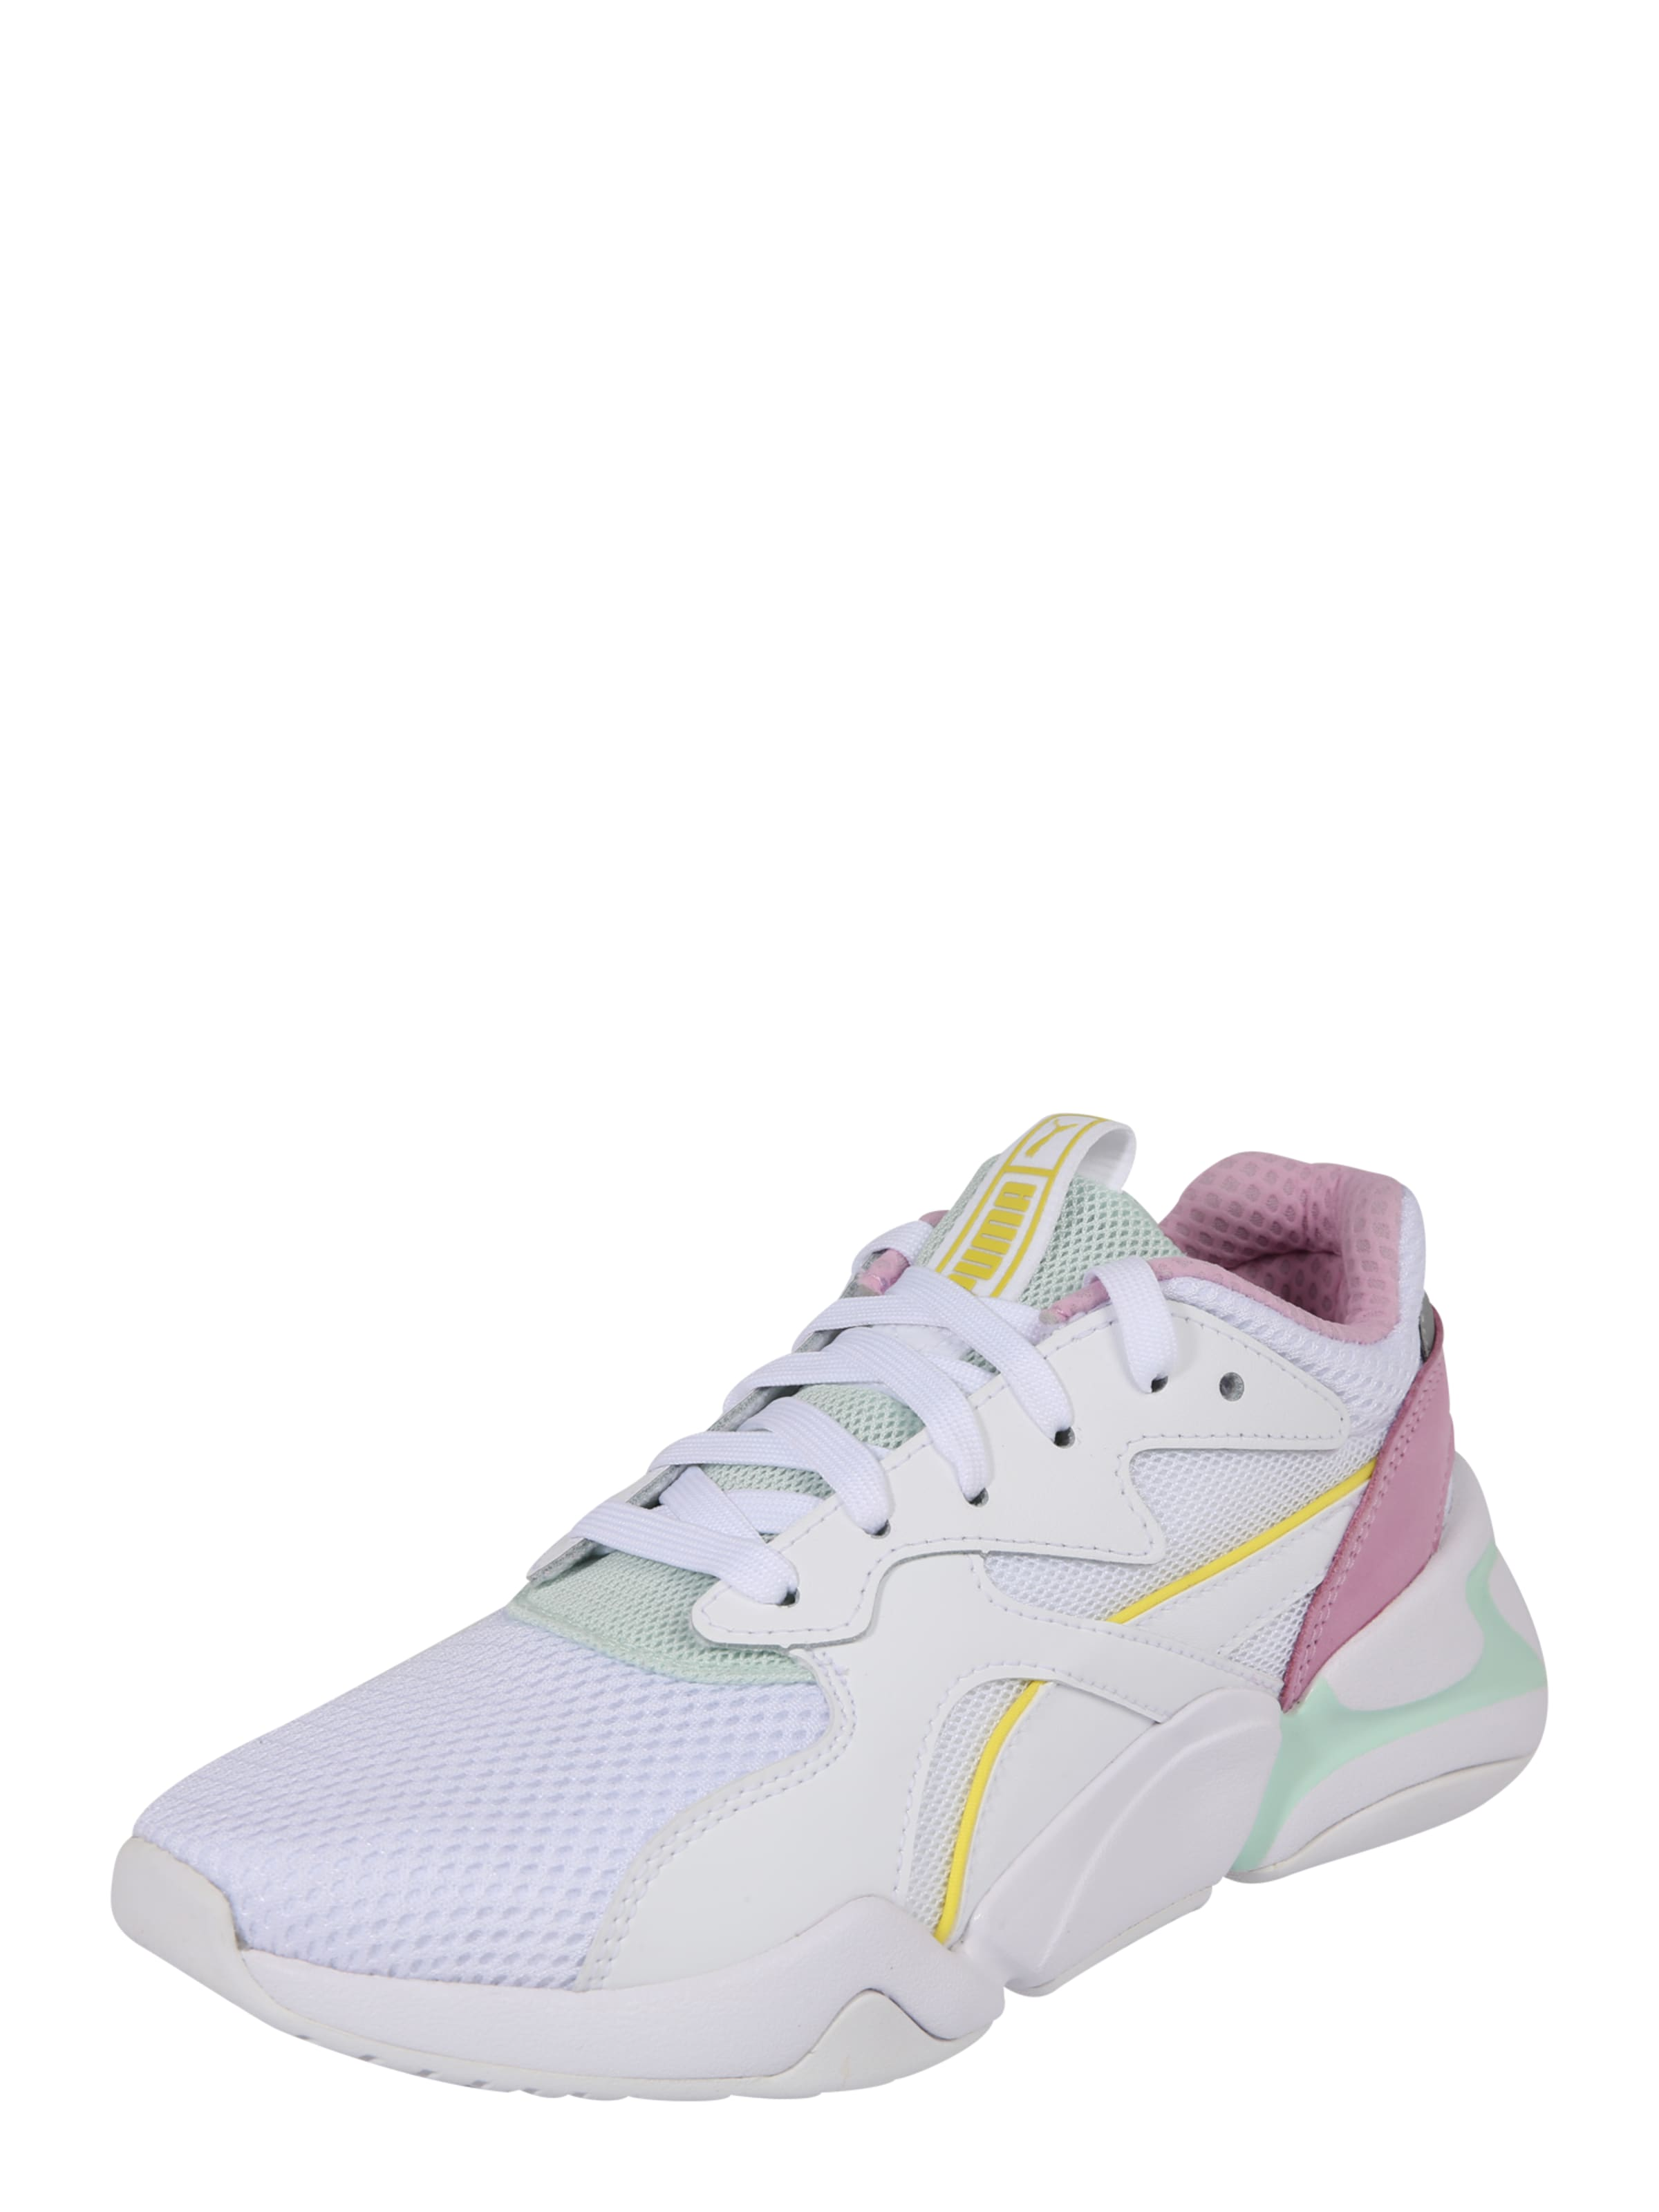 Puma 'nova' Sneaker Sneaker In GrauMischfarben Puma OkXZ80nNwP